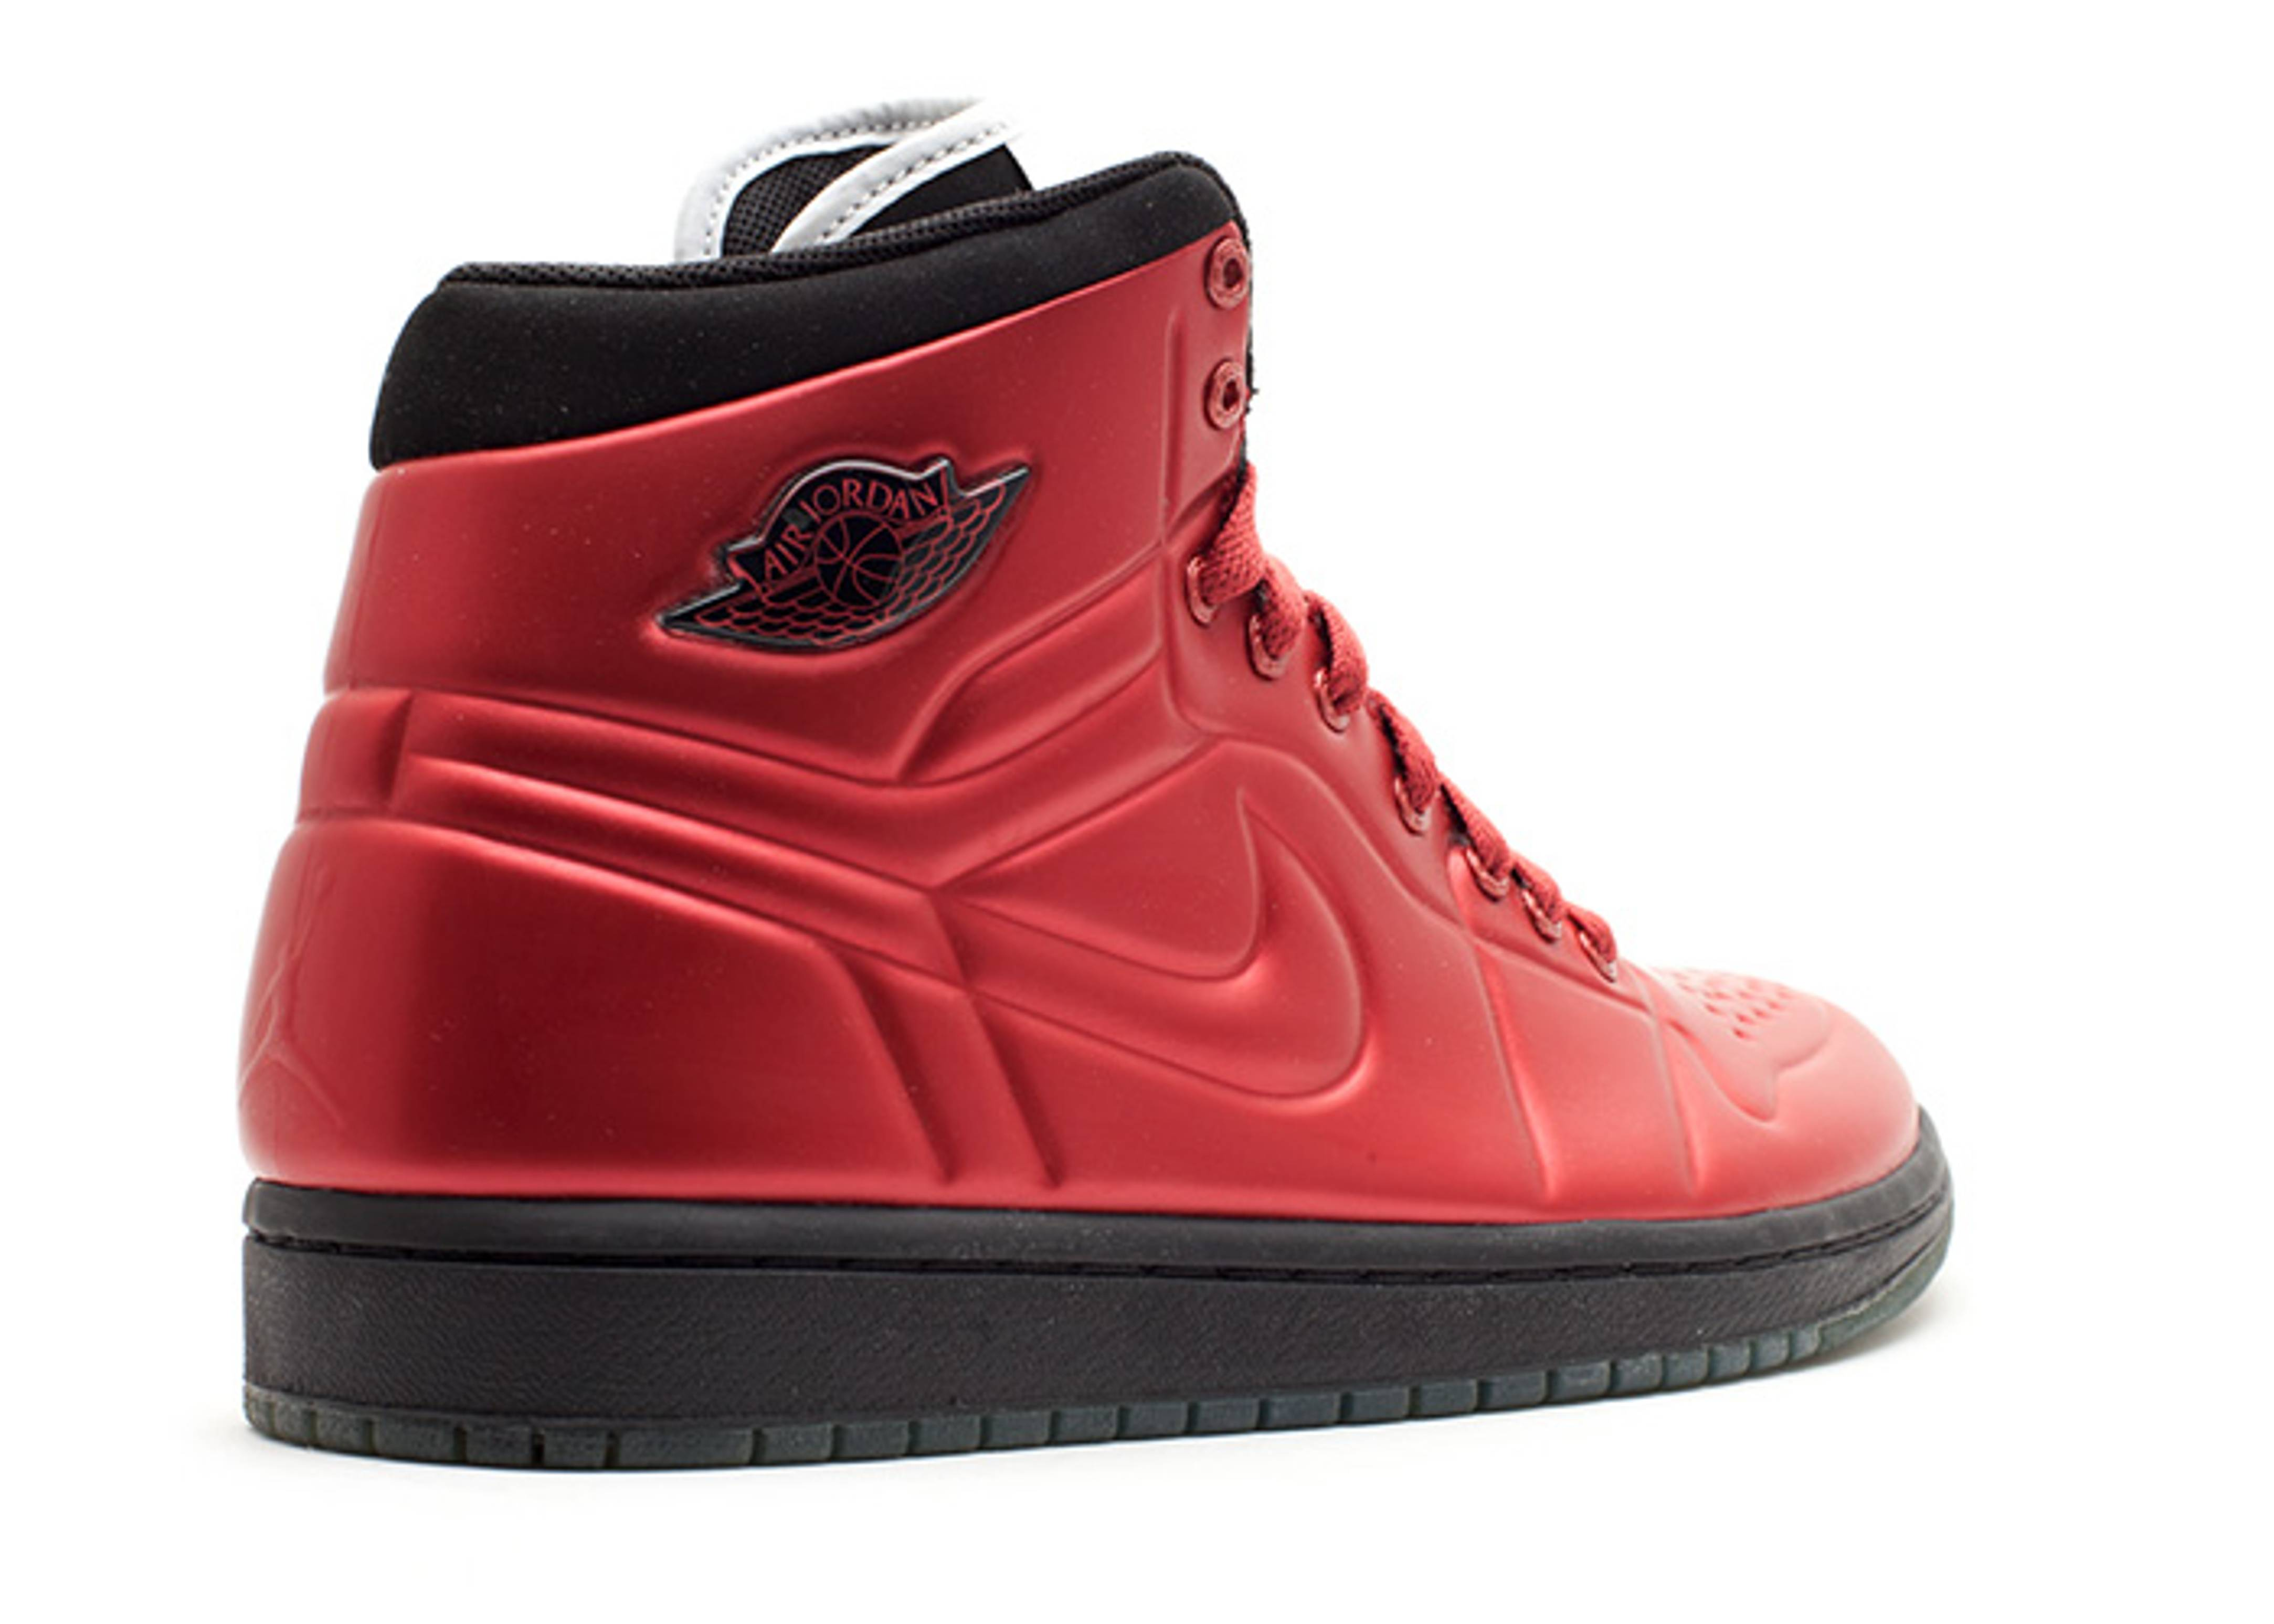 0a3ef7146d22f NICE🔥 Nike Air Jordan 1 Anodized Foamposite Armor 11 University Blue 414823-401  jordan. aj 1 anodized ...